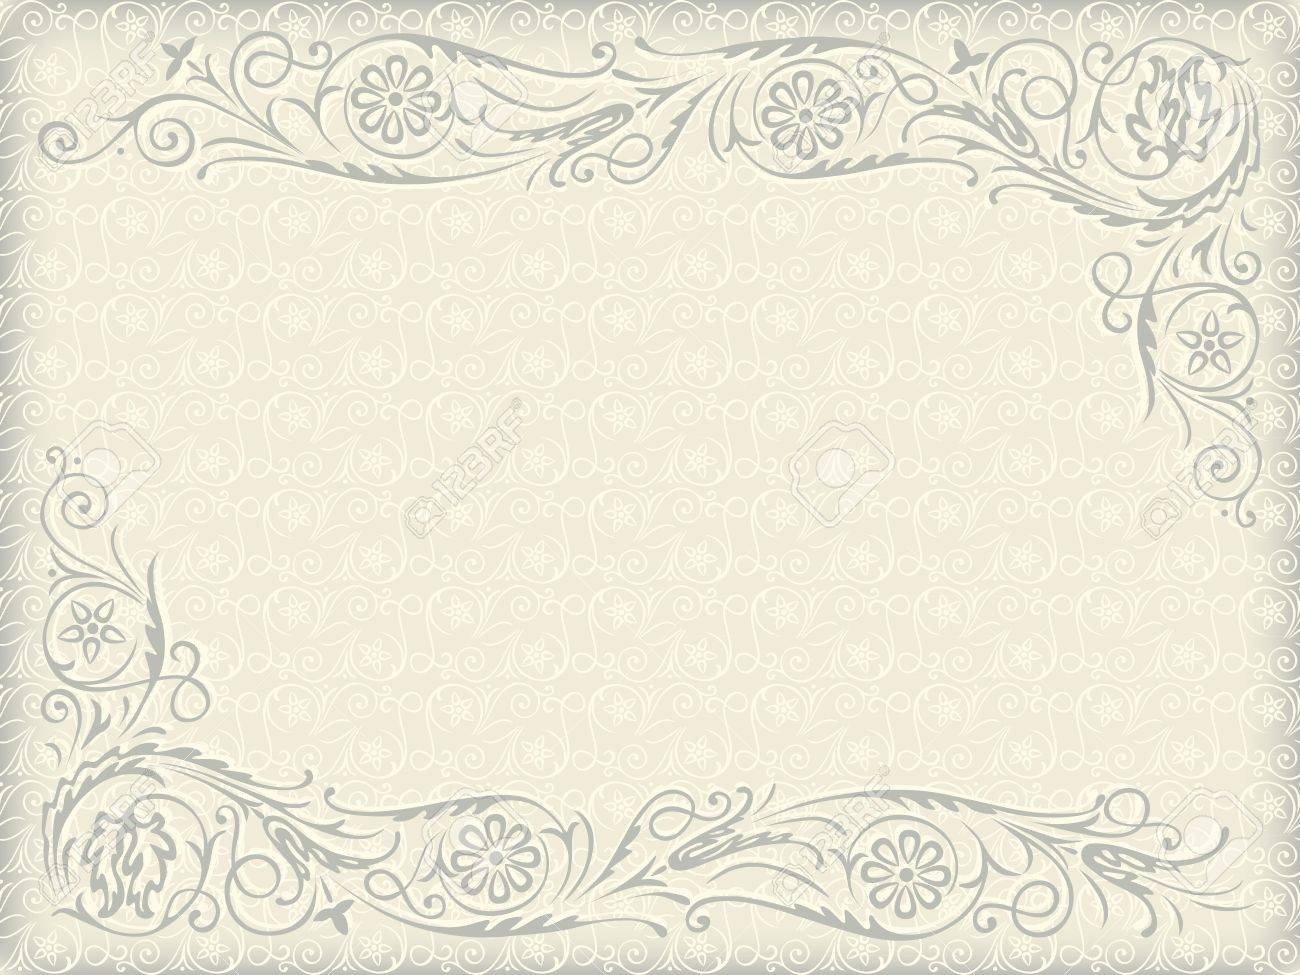 Ornamental floral wedding background frame with swirling ornamental floral wedding background frame with swirling decorative elements stock vector 15646178 junglespirit Image collections